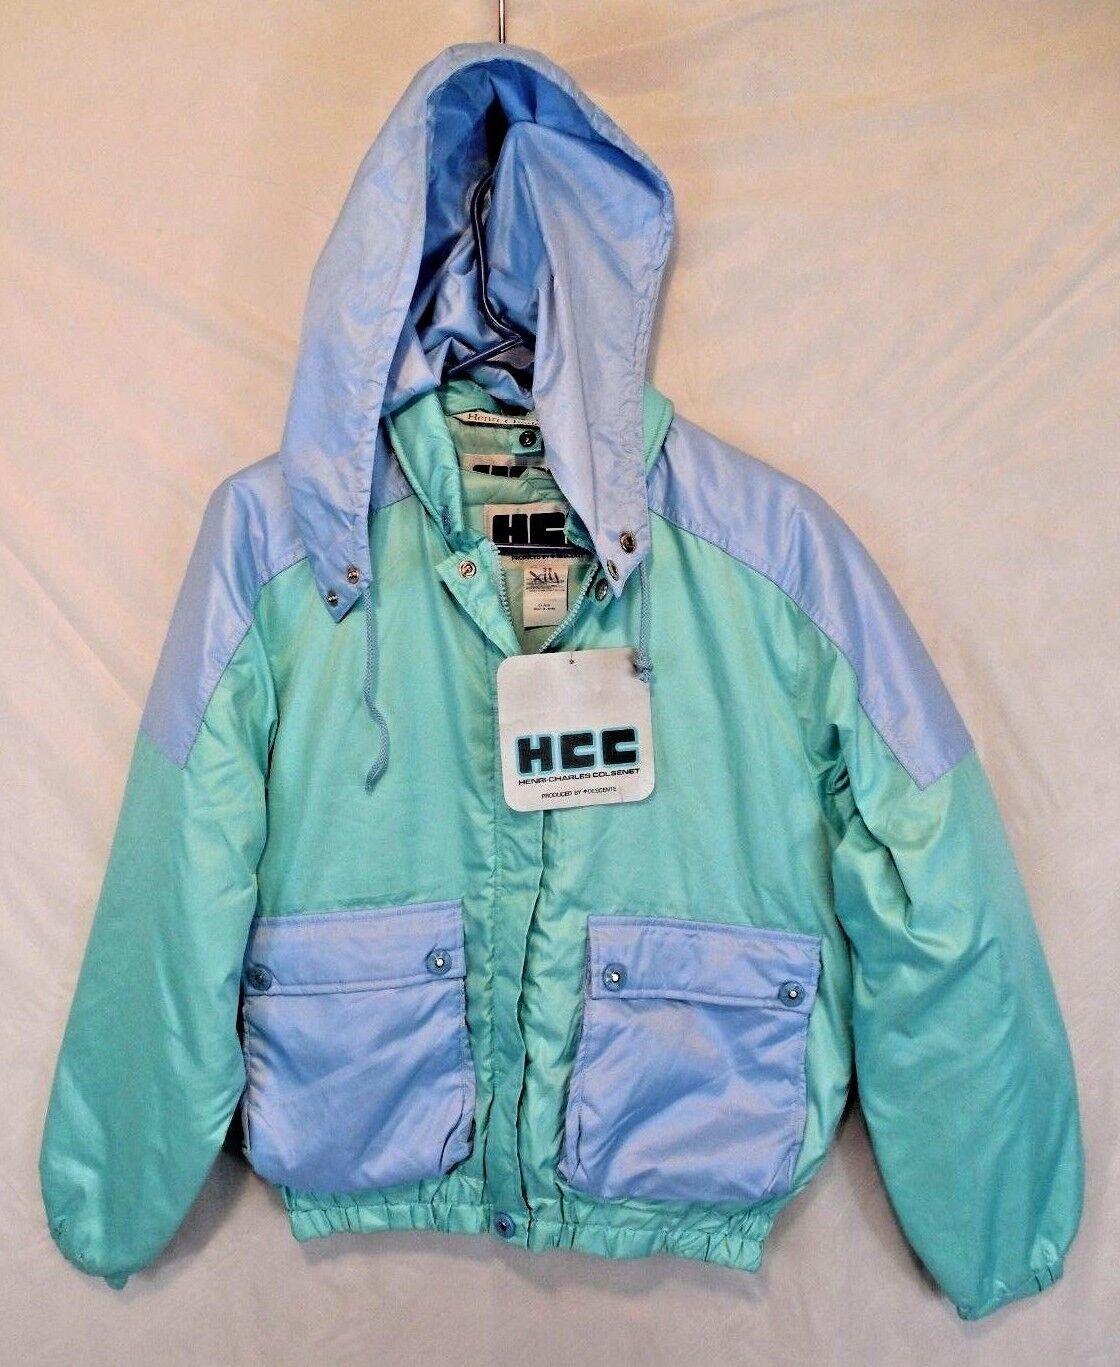 New Vtg Japan made HCC Henri Charles Colsenet Down Ski jacket Sz 38 S M Descente